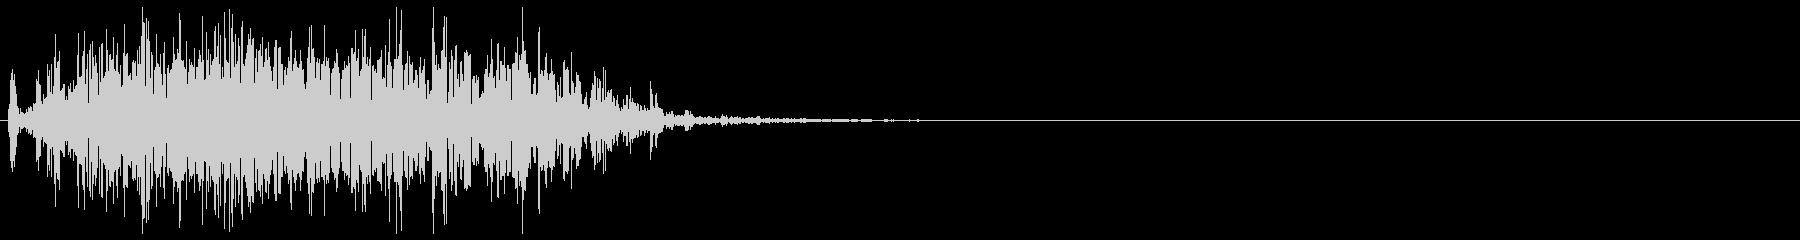 SF衝撃波・重力・魔法#7の未再生の波形